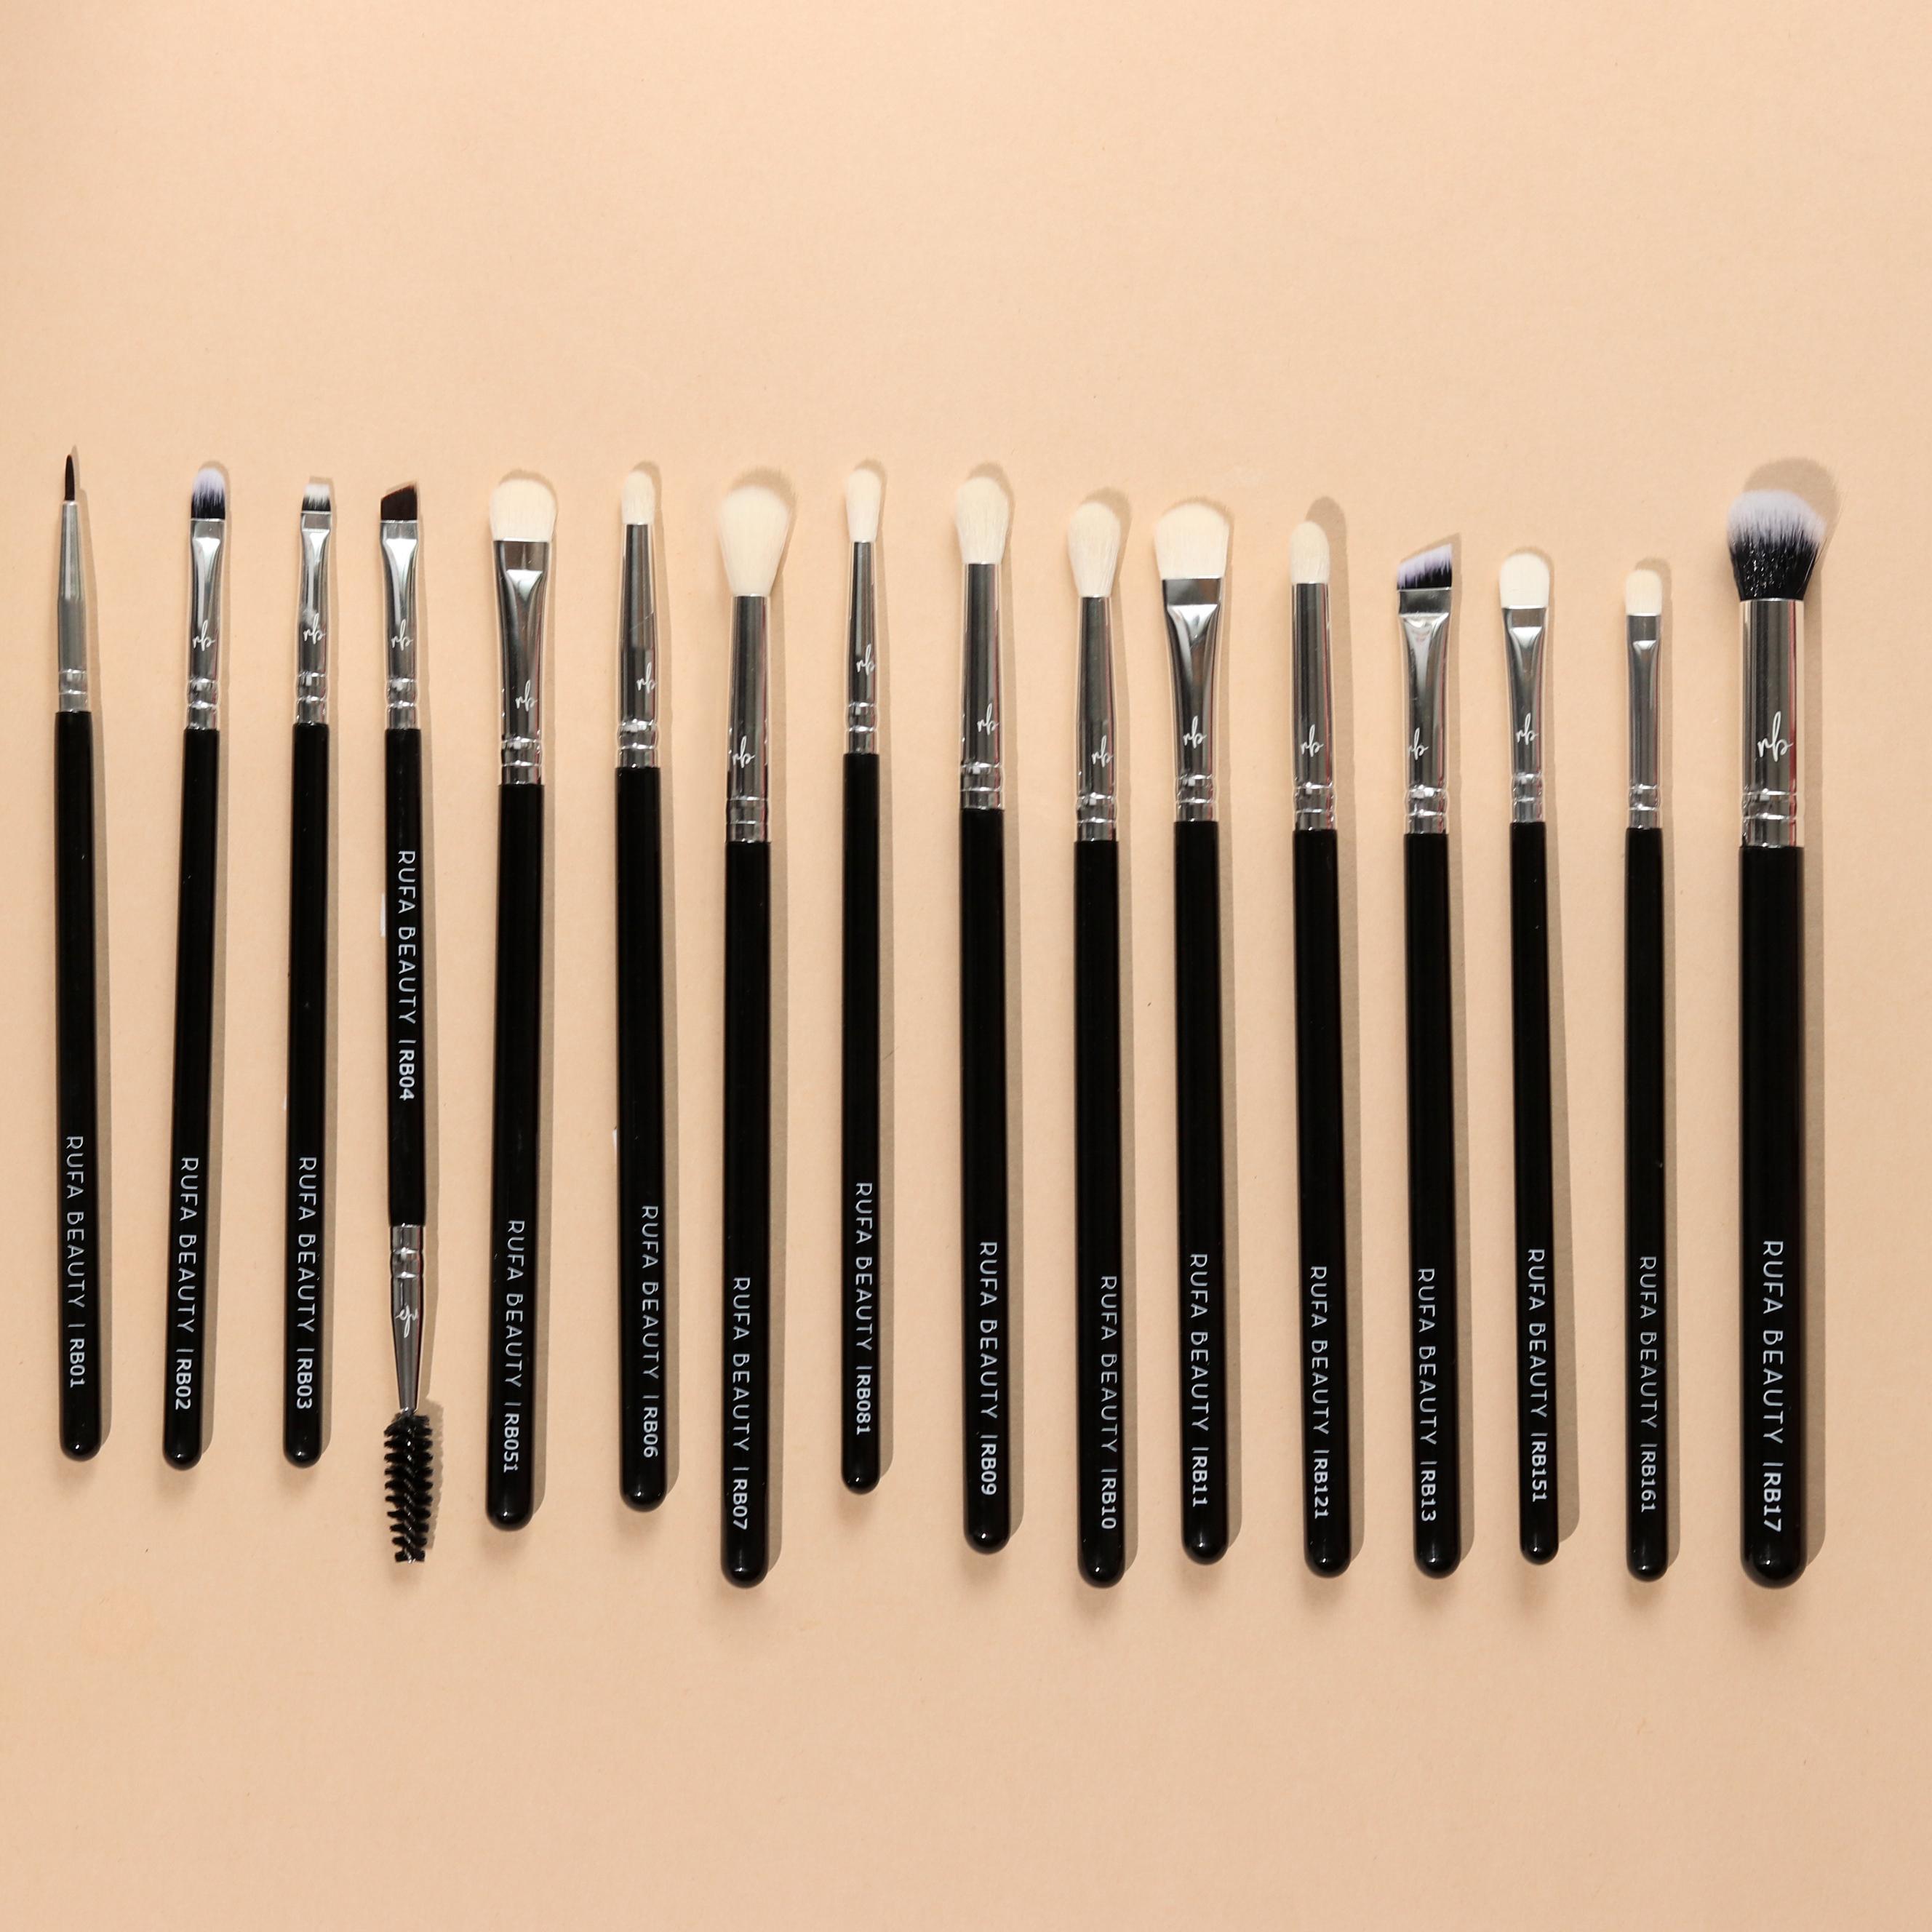 New Remastered Pro Eye Brushes – Complete Eye Brush set of 16 Brushes (includes concealer buffing brush)